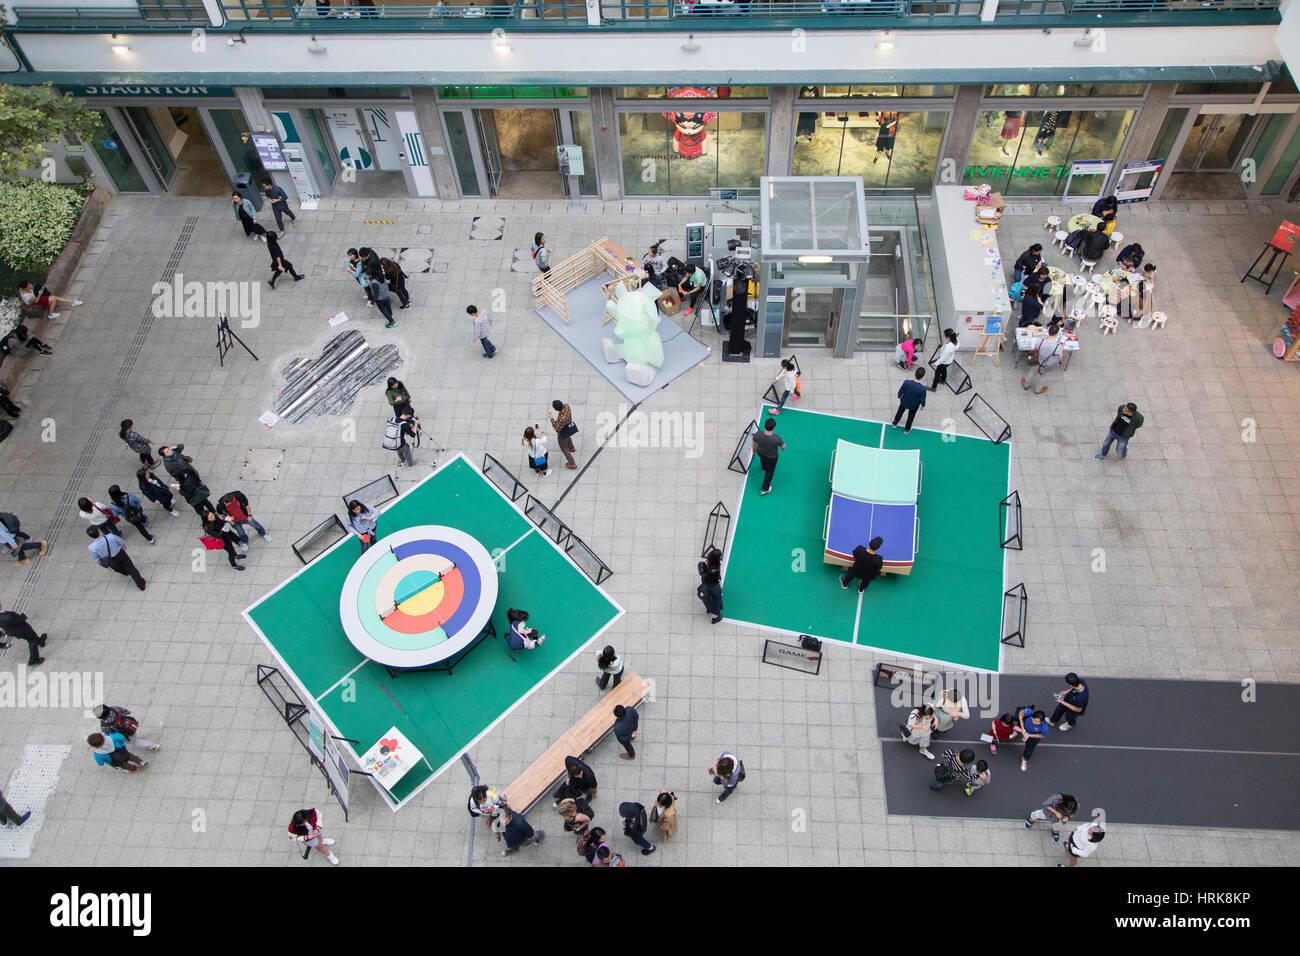 Art installation in PMQ (former Police Married Quarters), Central, Hong Kong Island, Hong Kong, China - Stock Image